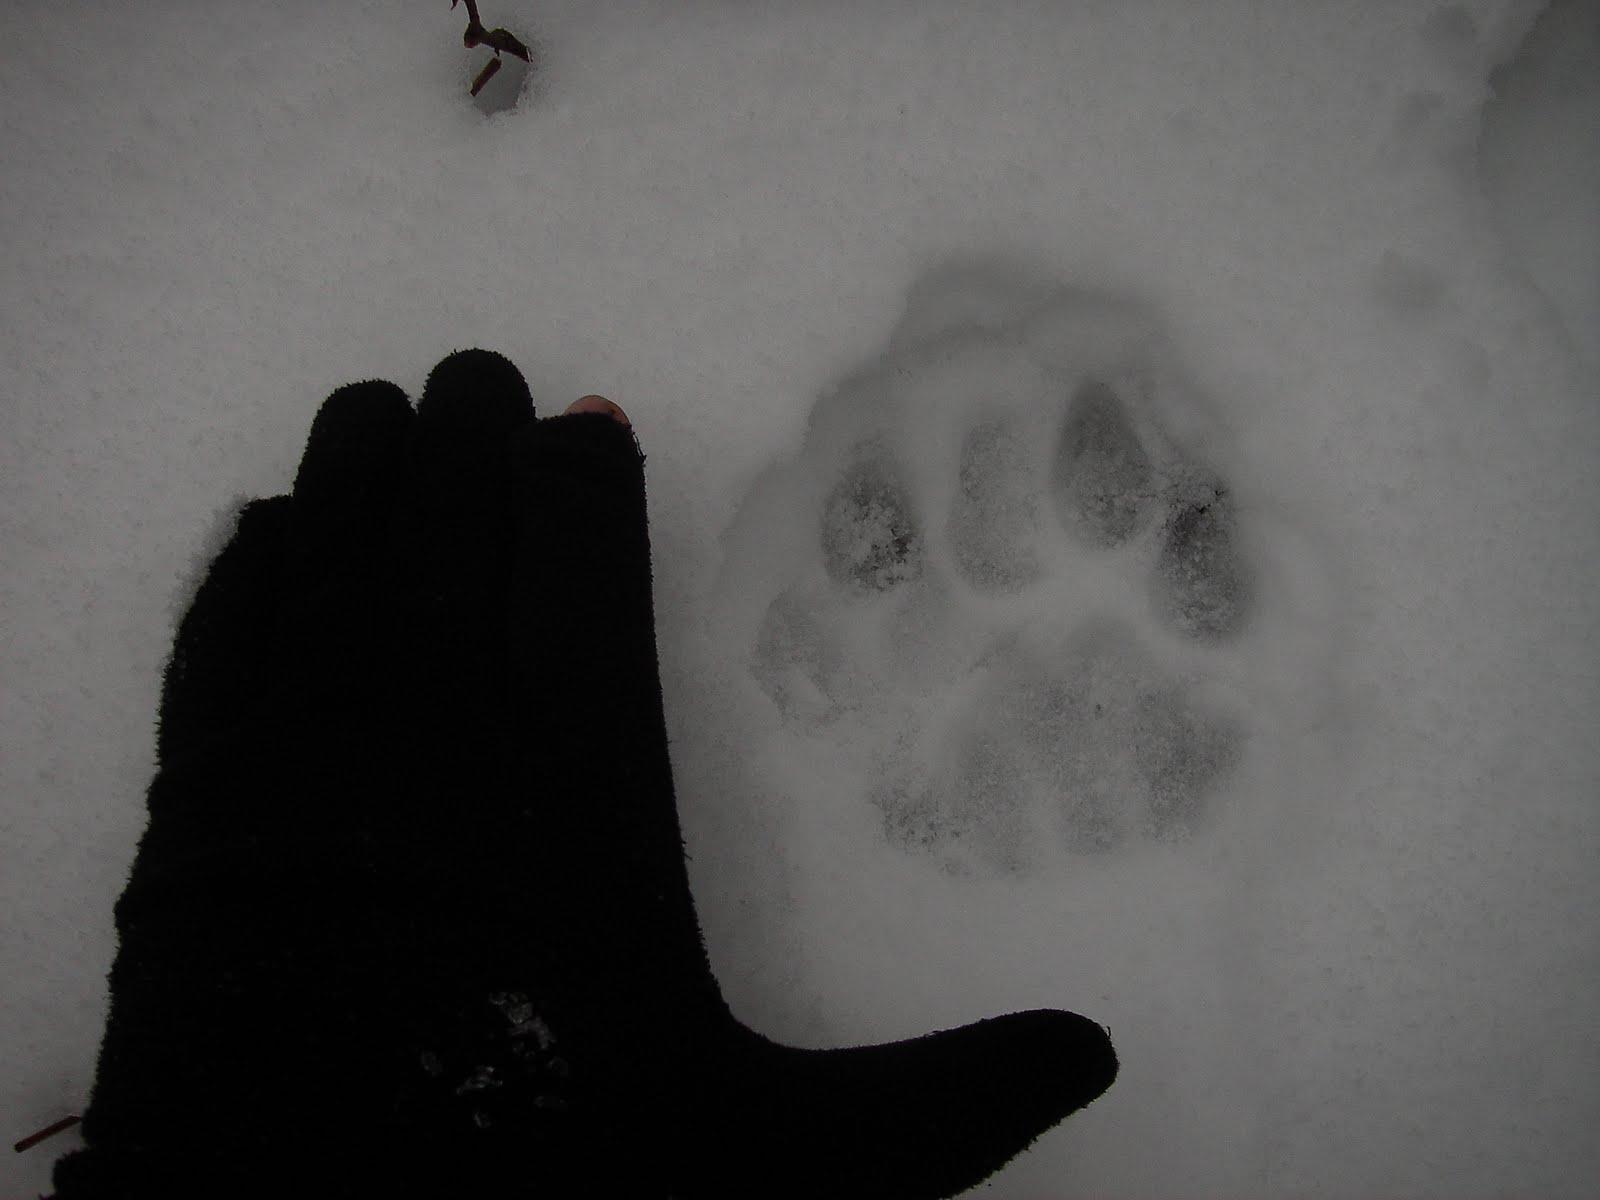 Wolf Track Vs Dog Track